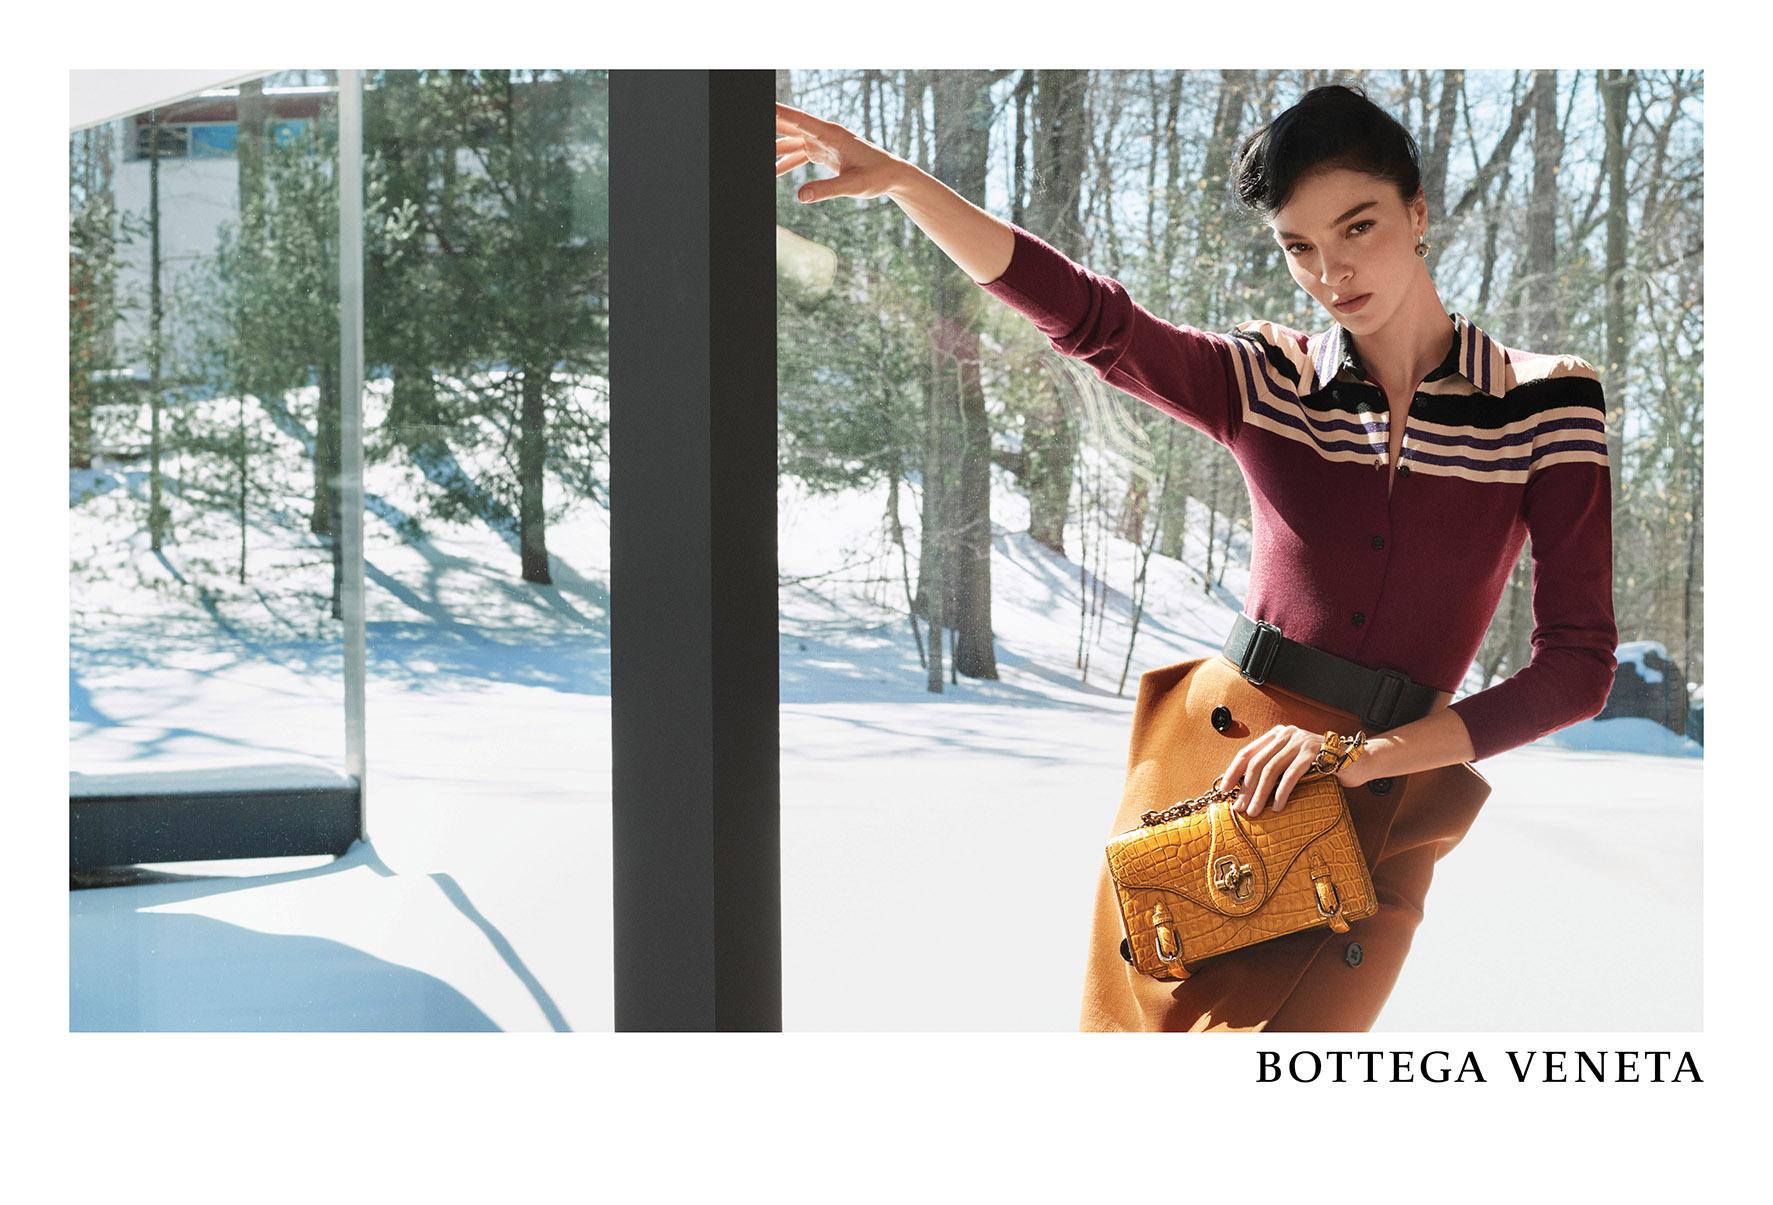 La campagne printemps-été 2017 de Bottega Veneta par Todd Hido